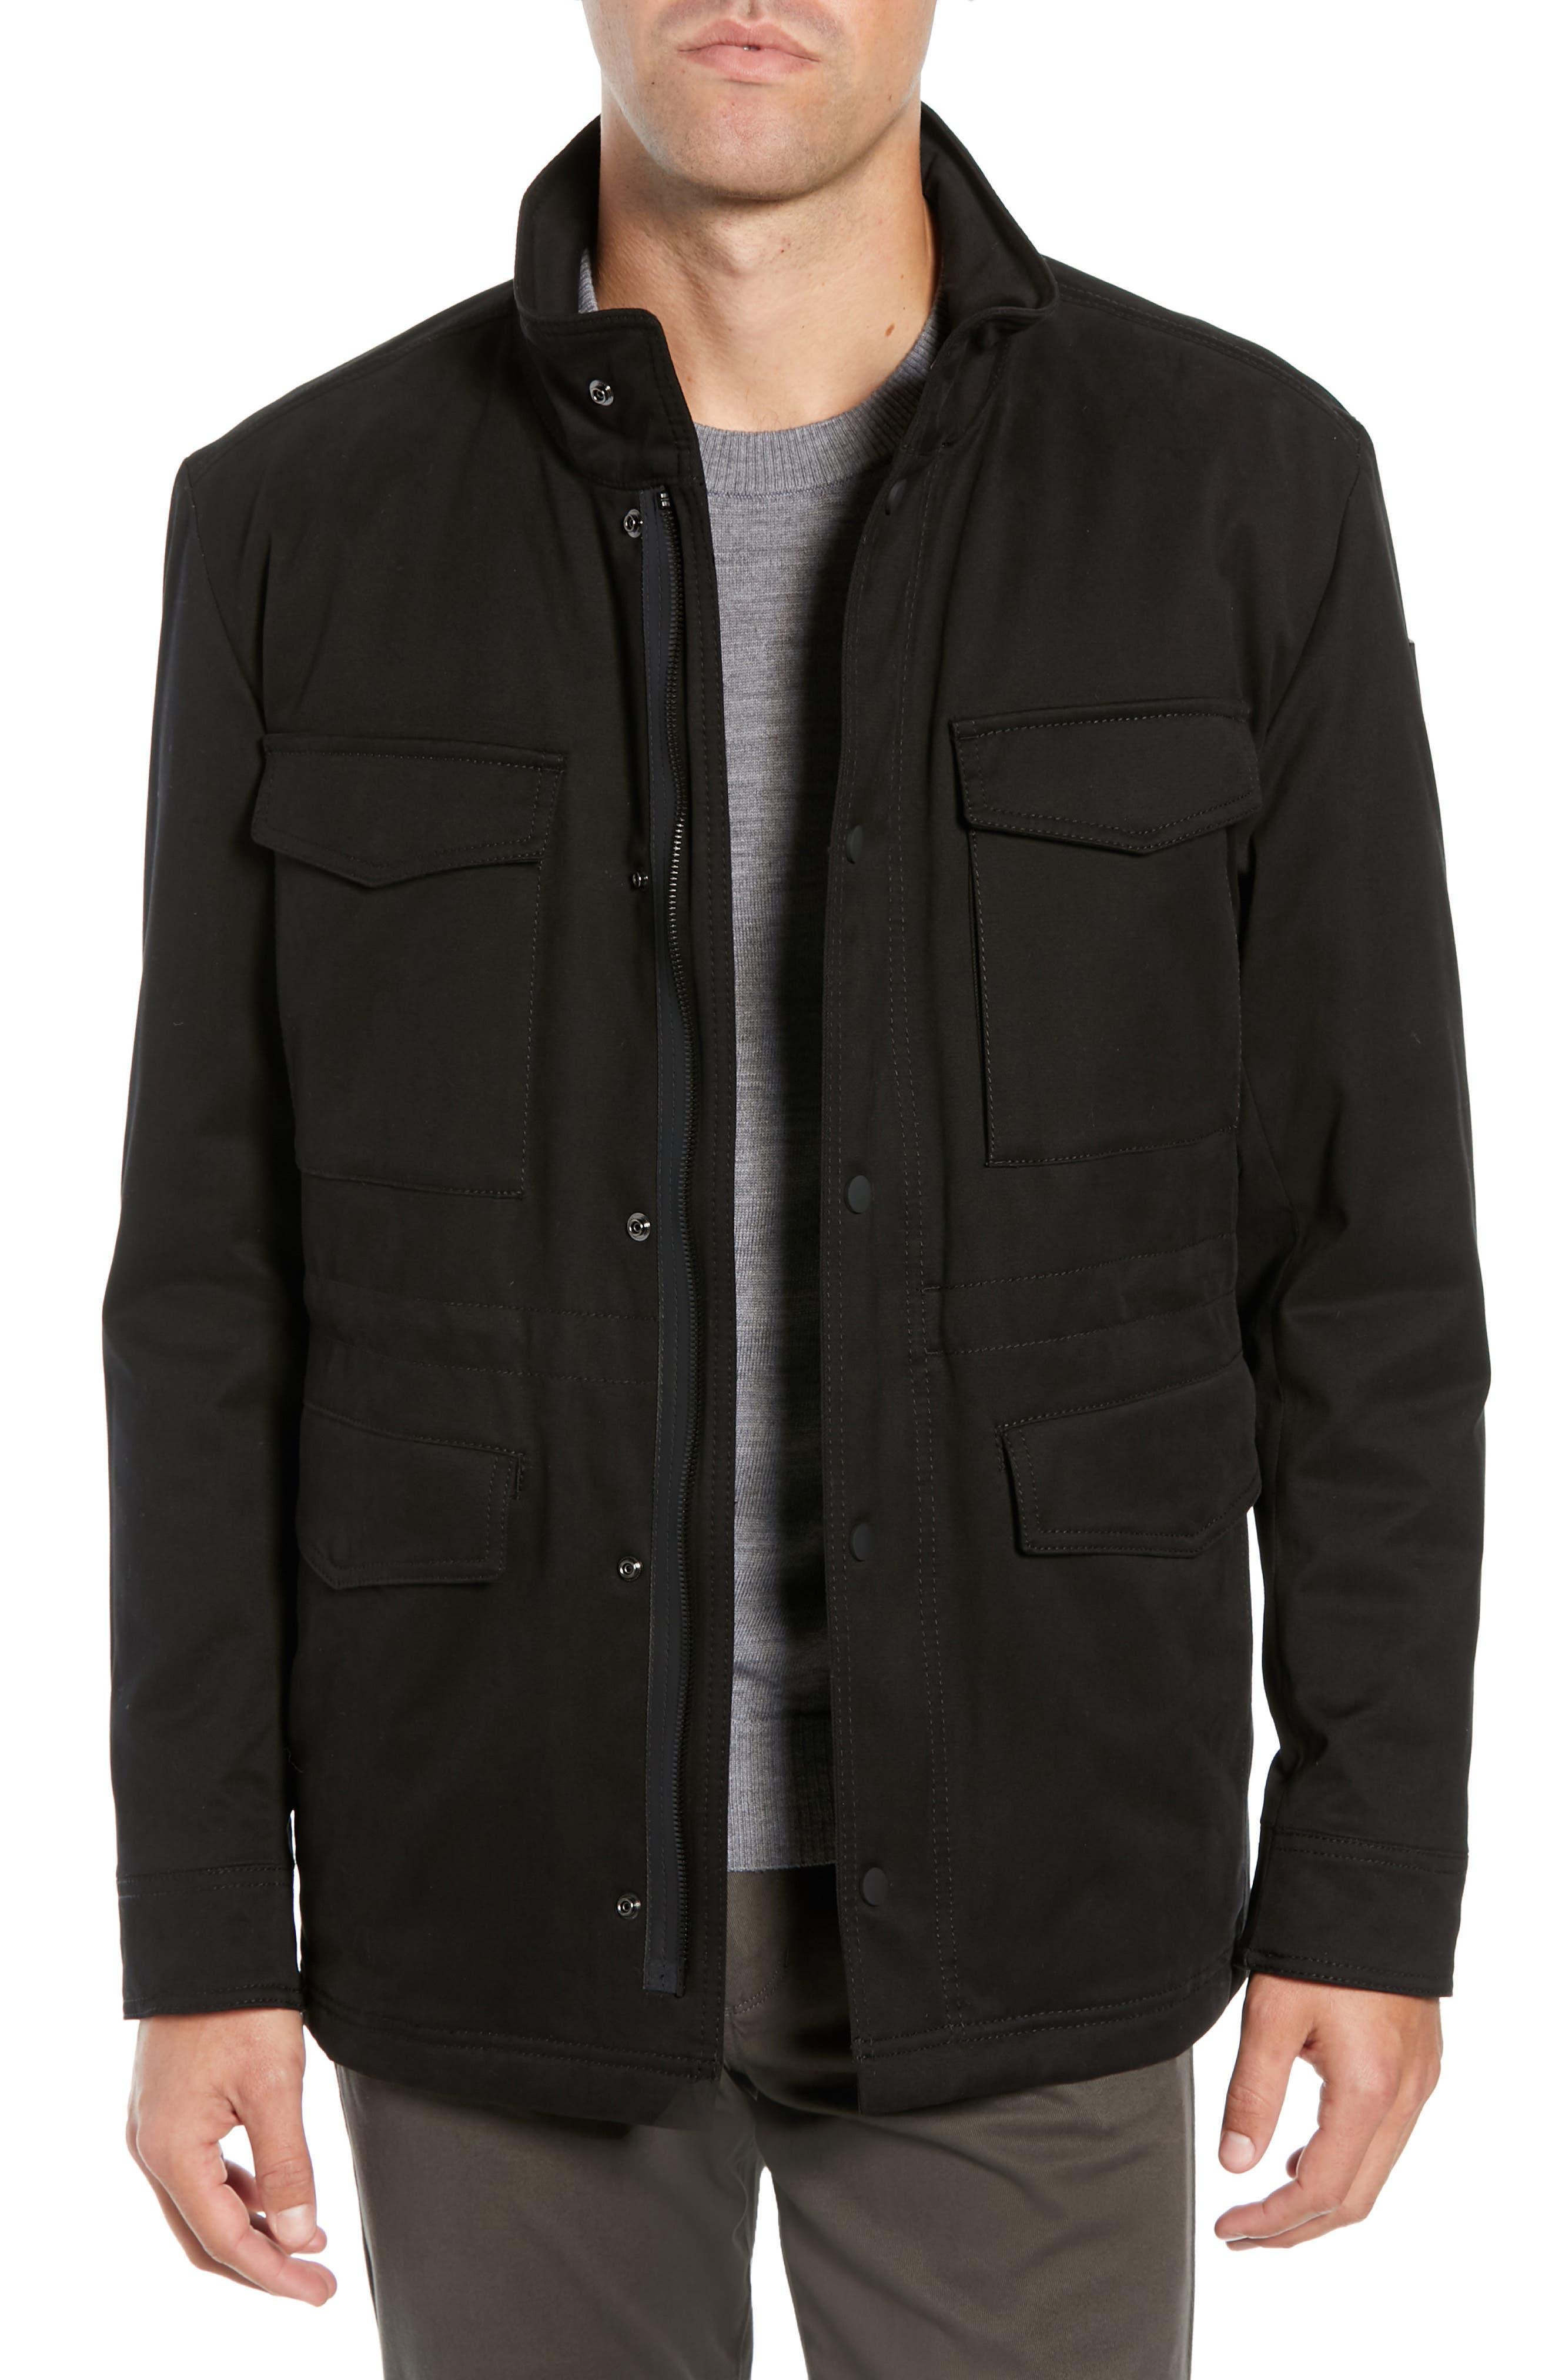 Oroy Regular Fit Field Jacket,                         Main,                         color, BLACK